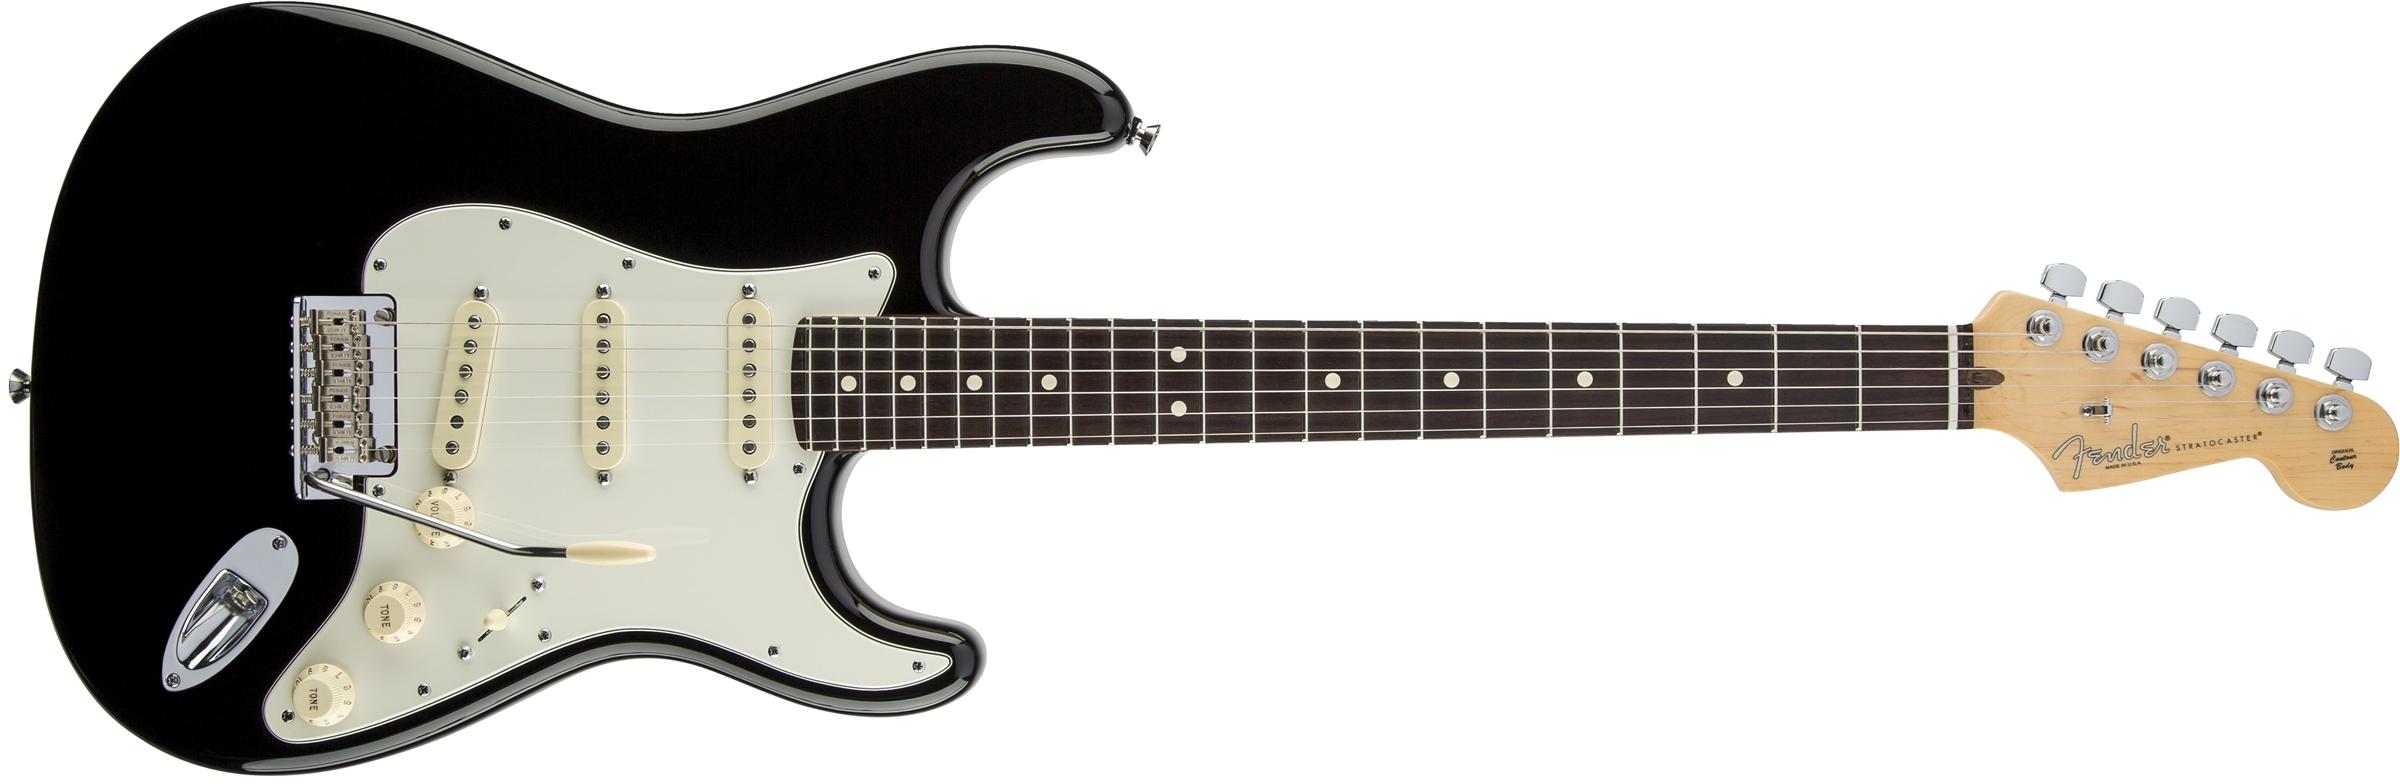 American Standard Stratocaster U00ae